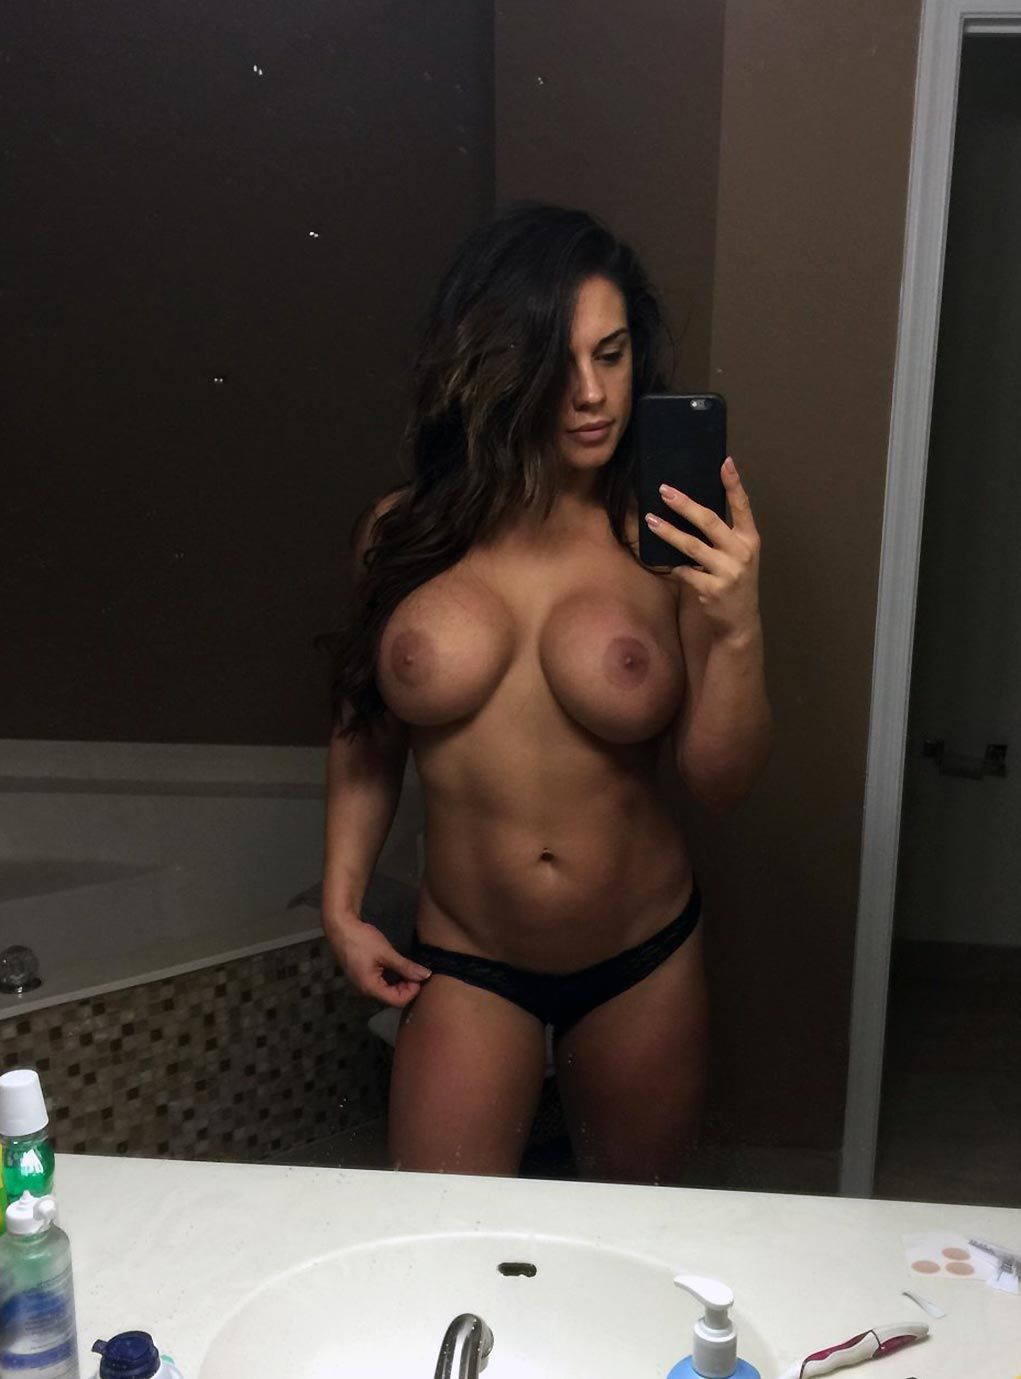 Celeste Bonin Nude Leaked The Fappening & Sexy 0170